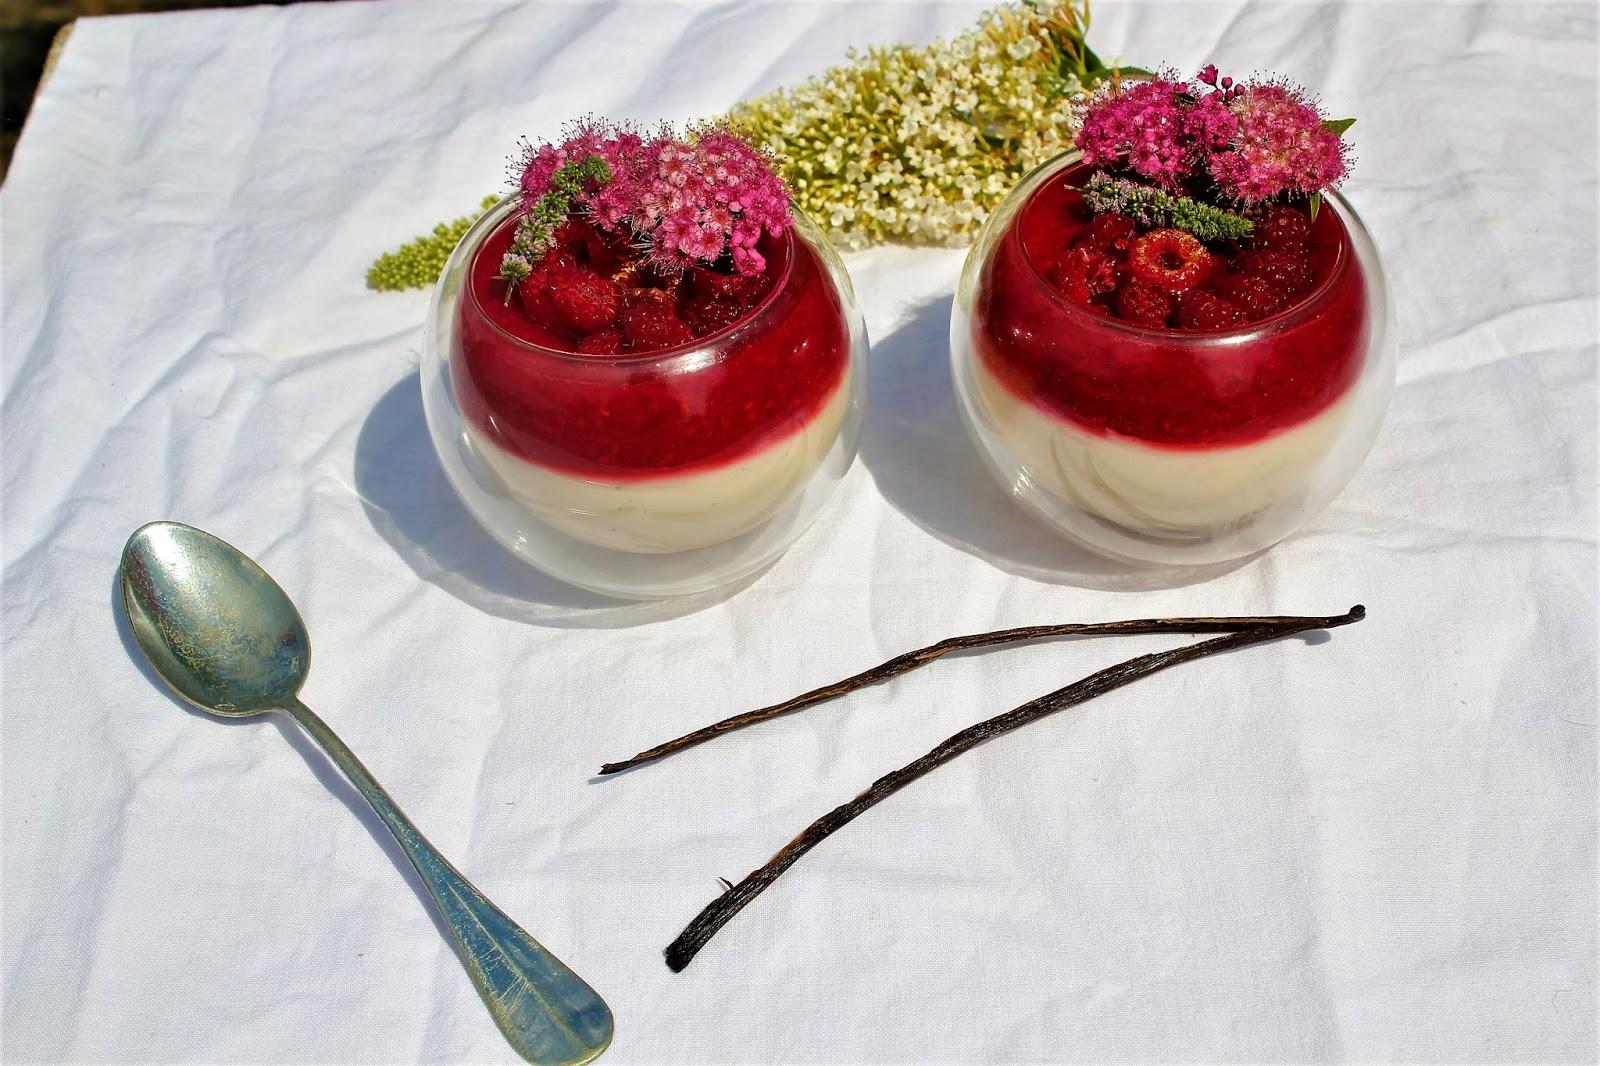 Thegarden of delights panna cotta aux framboises vegan sans gluten - Panna cotta sans gelatine ...